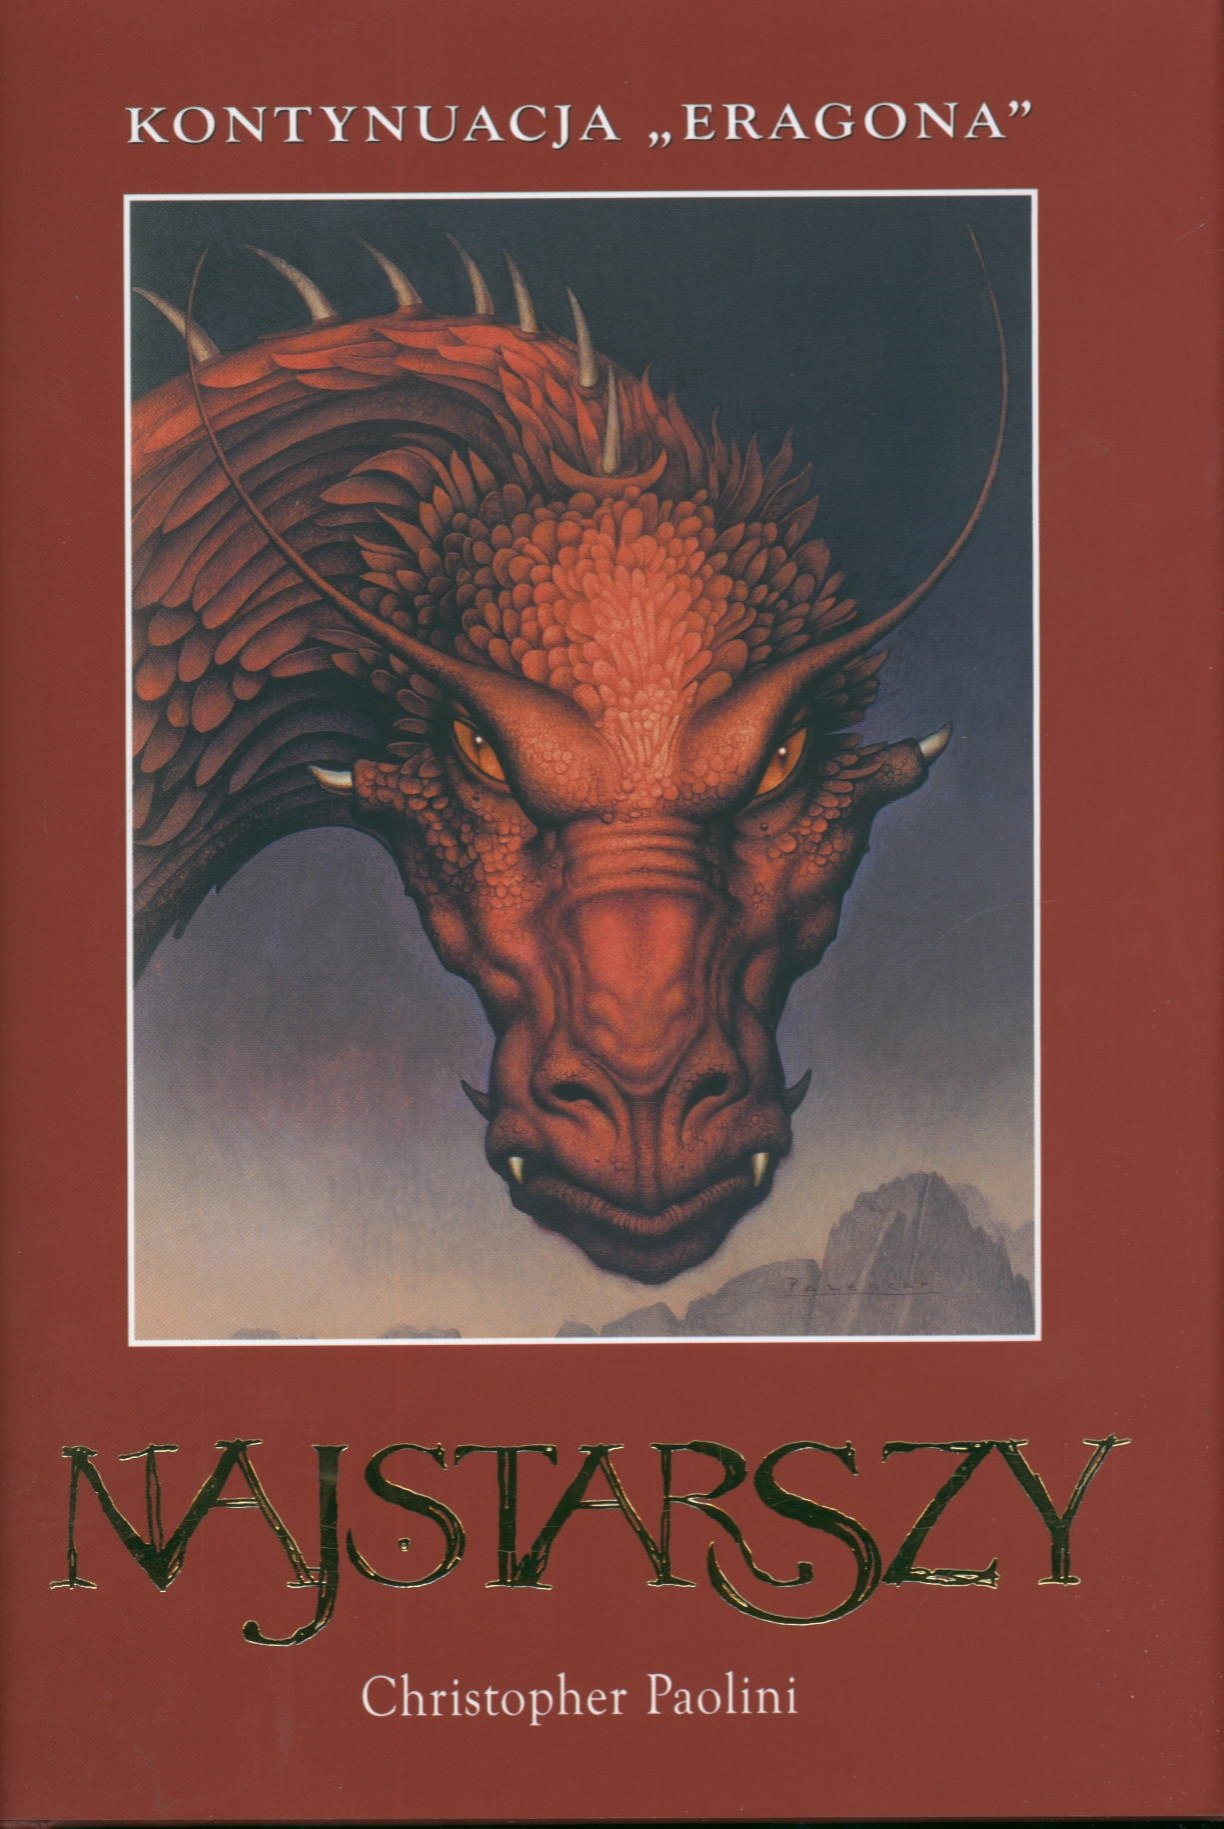 Najstarszy Eragon II